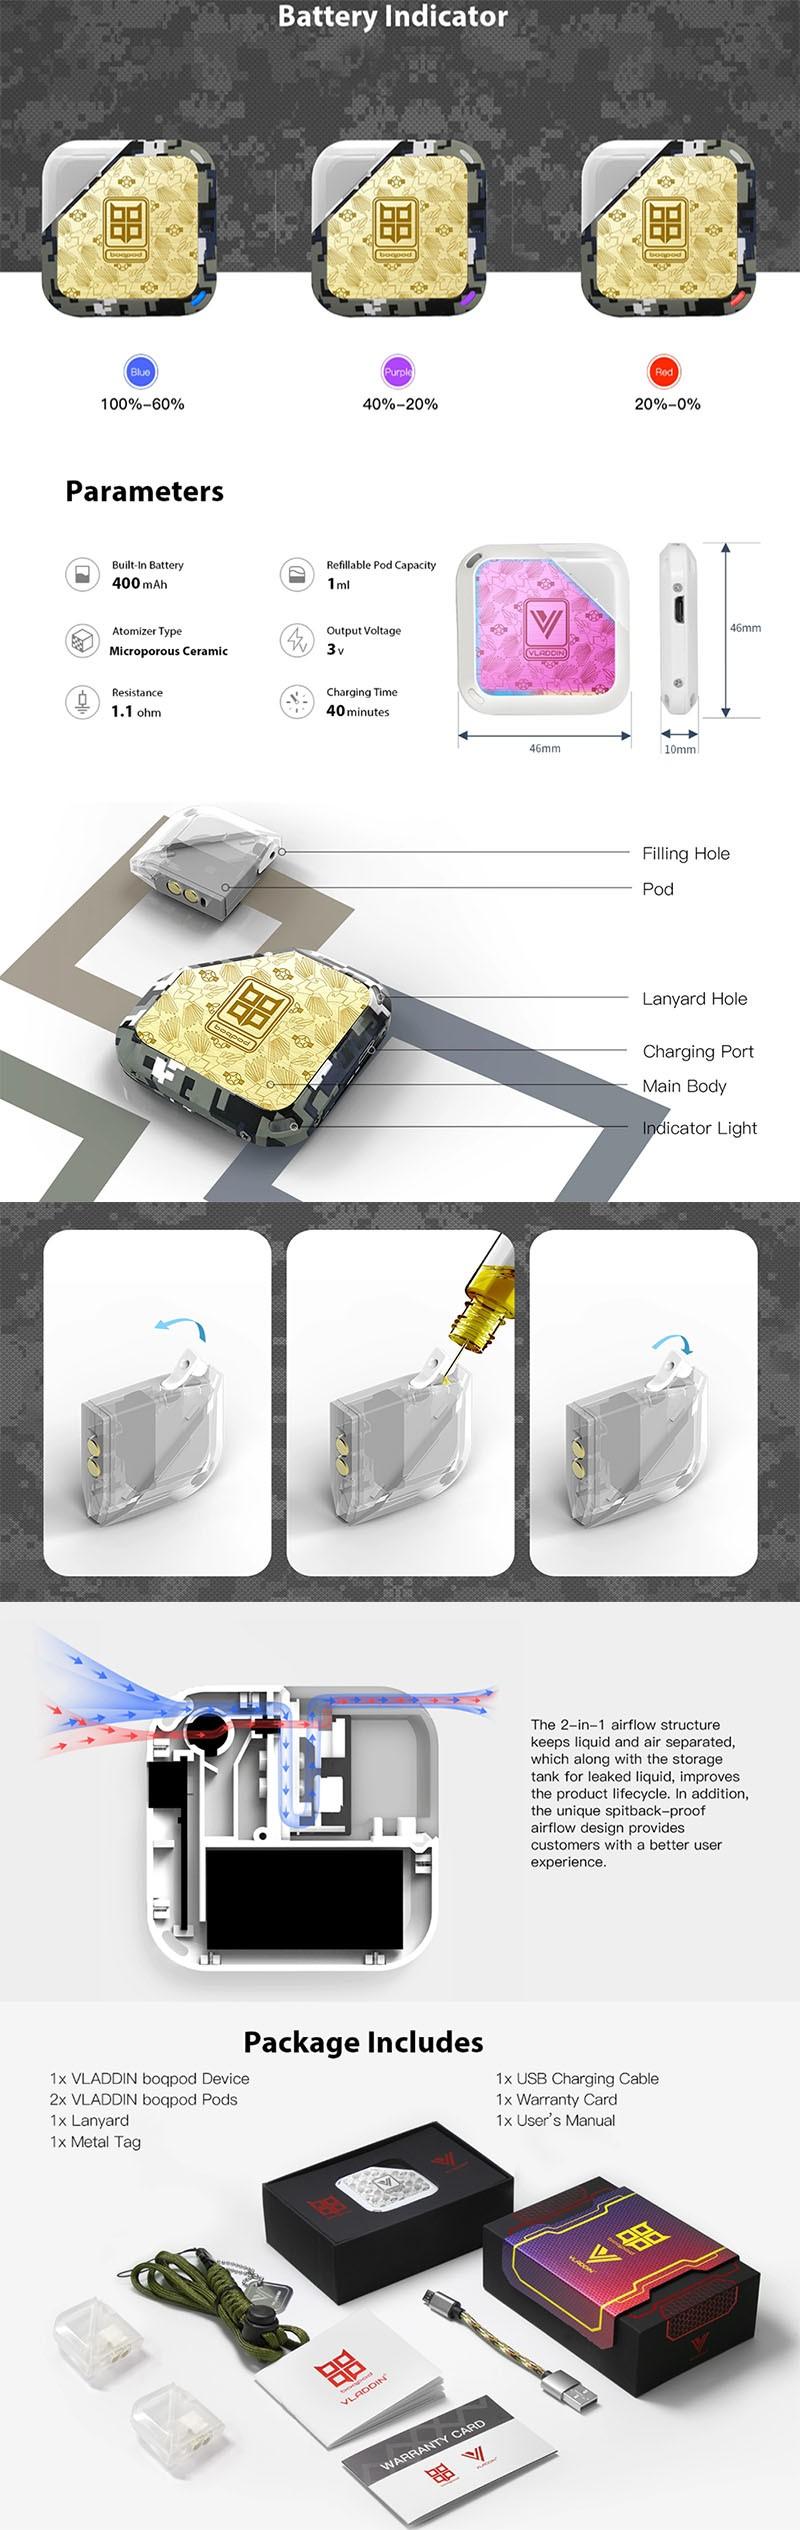 Vladdin Boqpod 400mAh Pod System Starter Kit